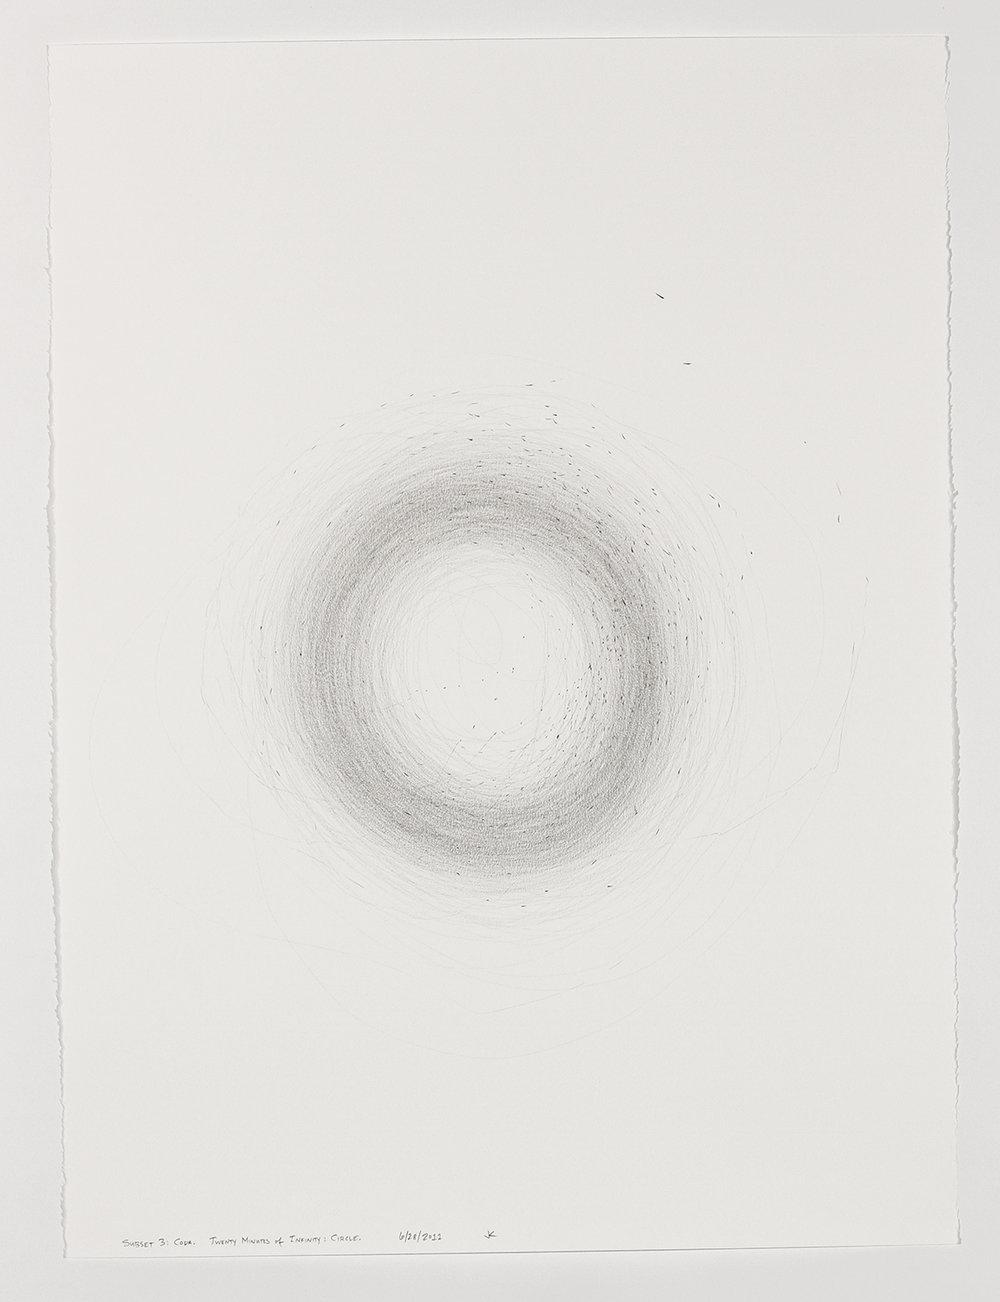 Twenty Minutes of Infinity: Circle